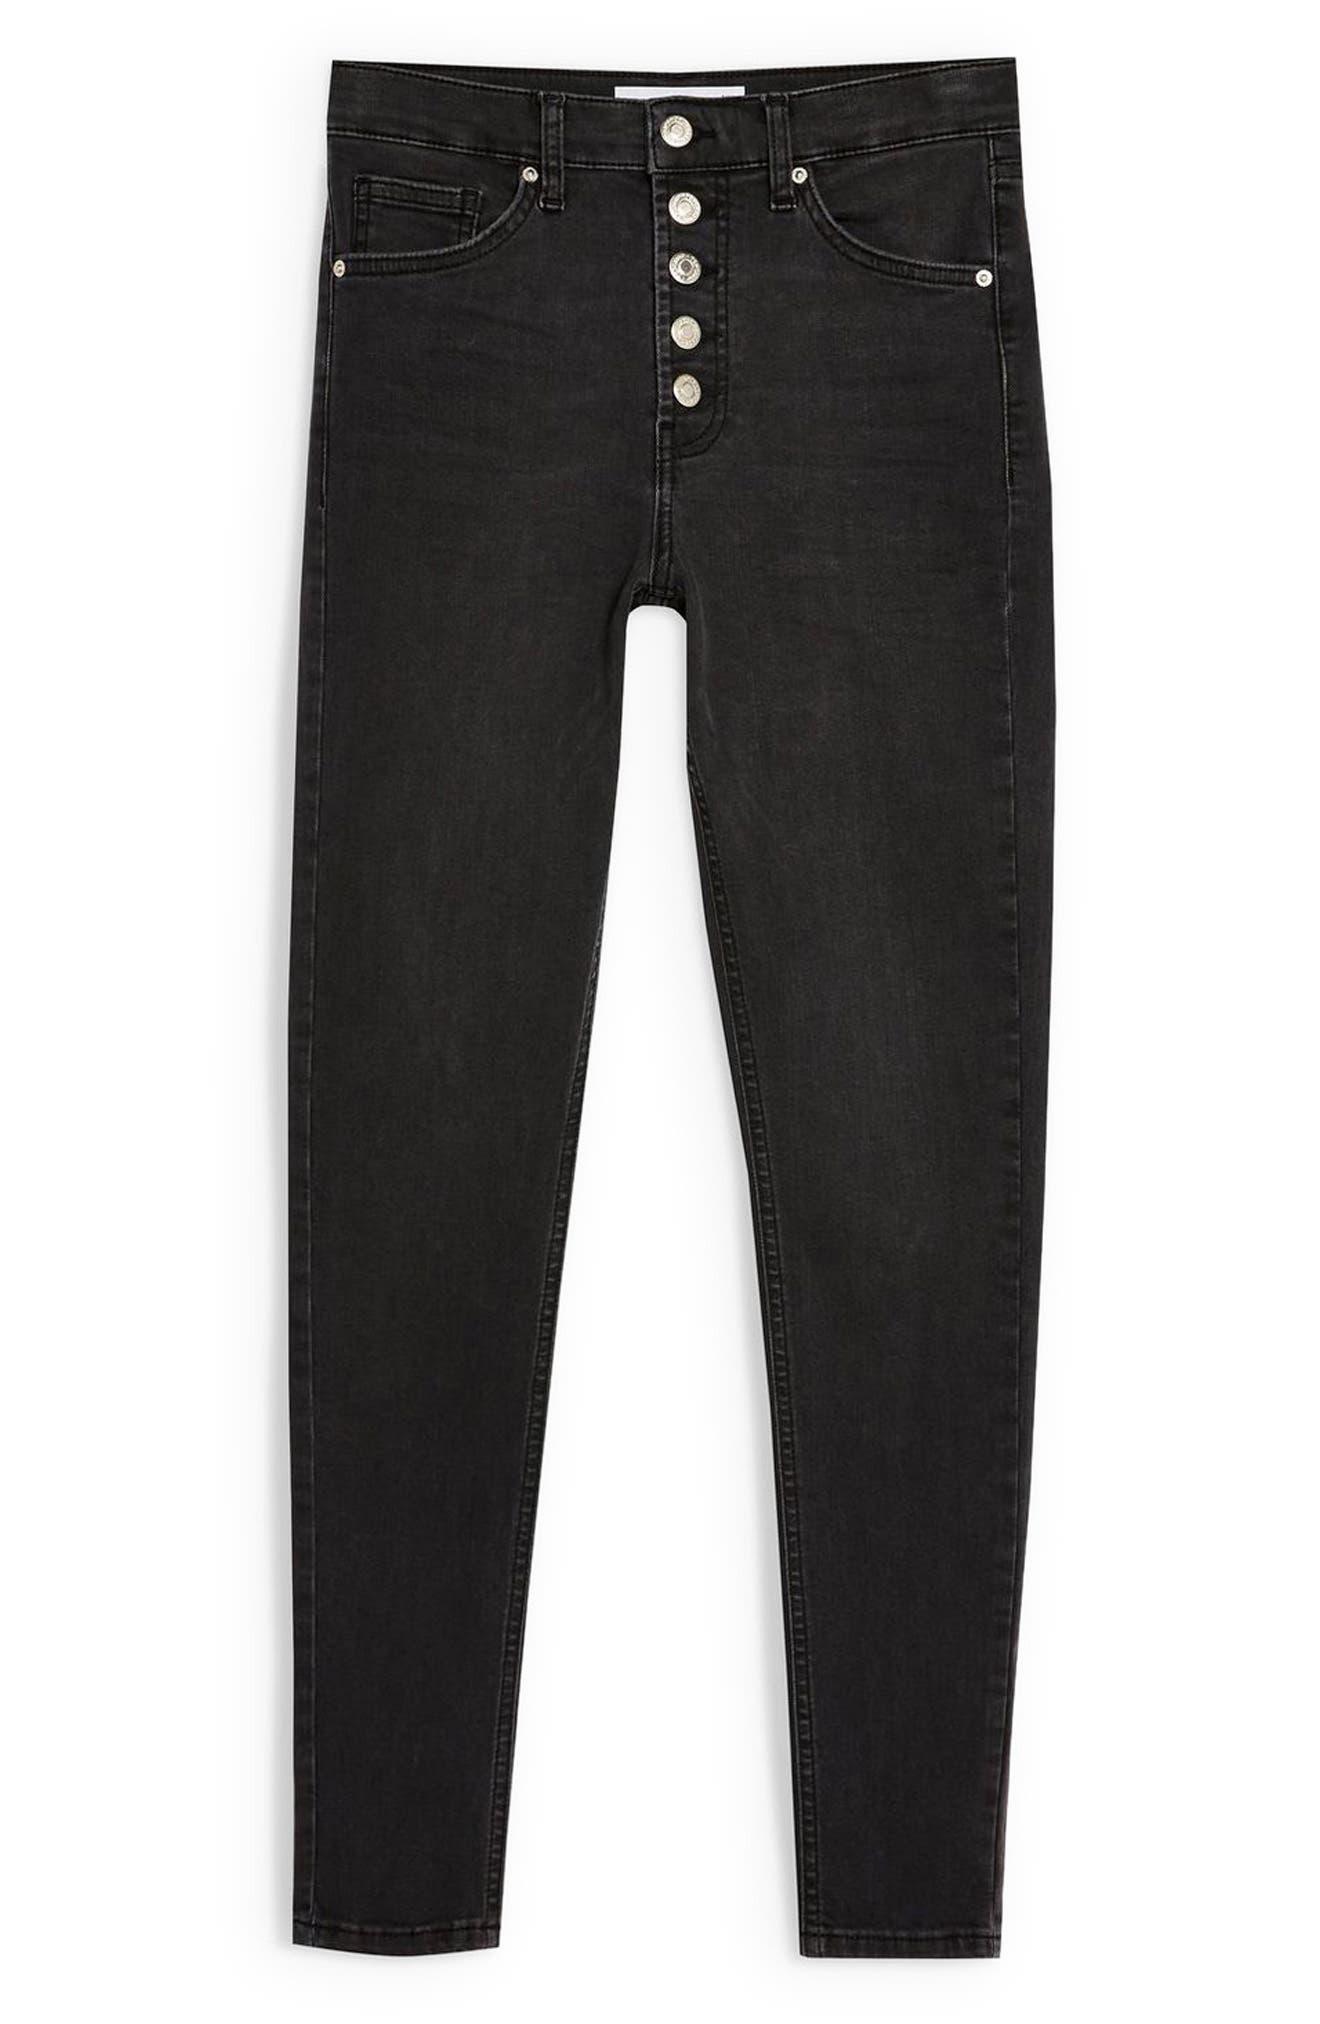 TOPSHOP,                             Jamie Moto Skinny Jeans,                             Alternate thumbnail 4, color,                             WASHED BLACK